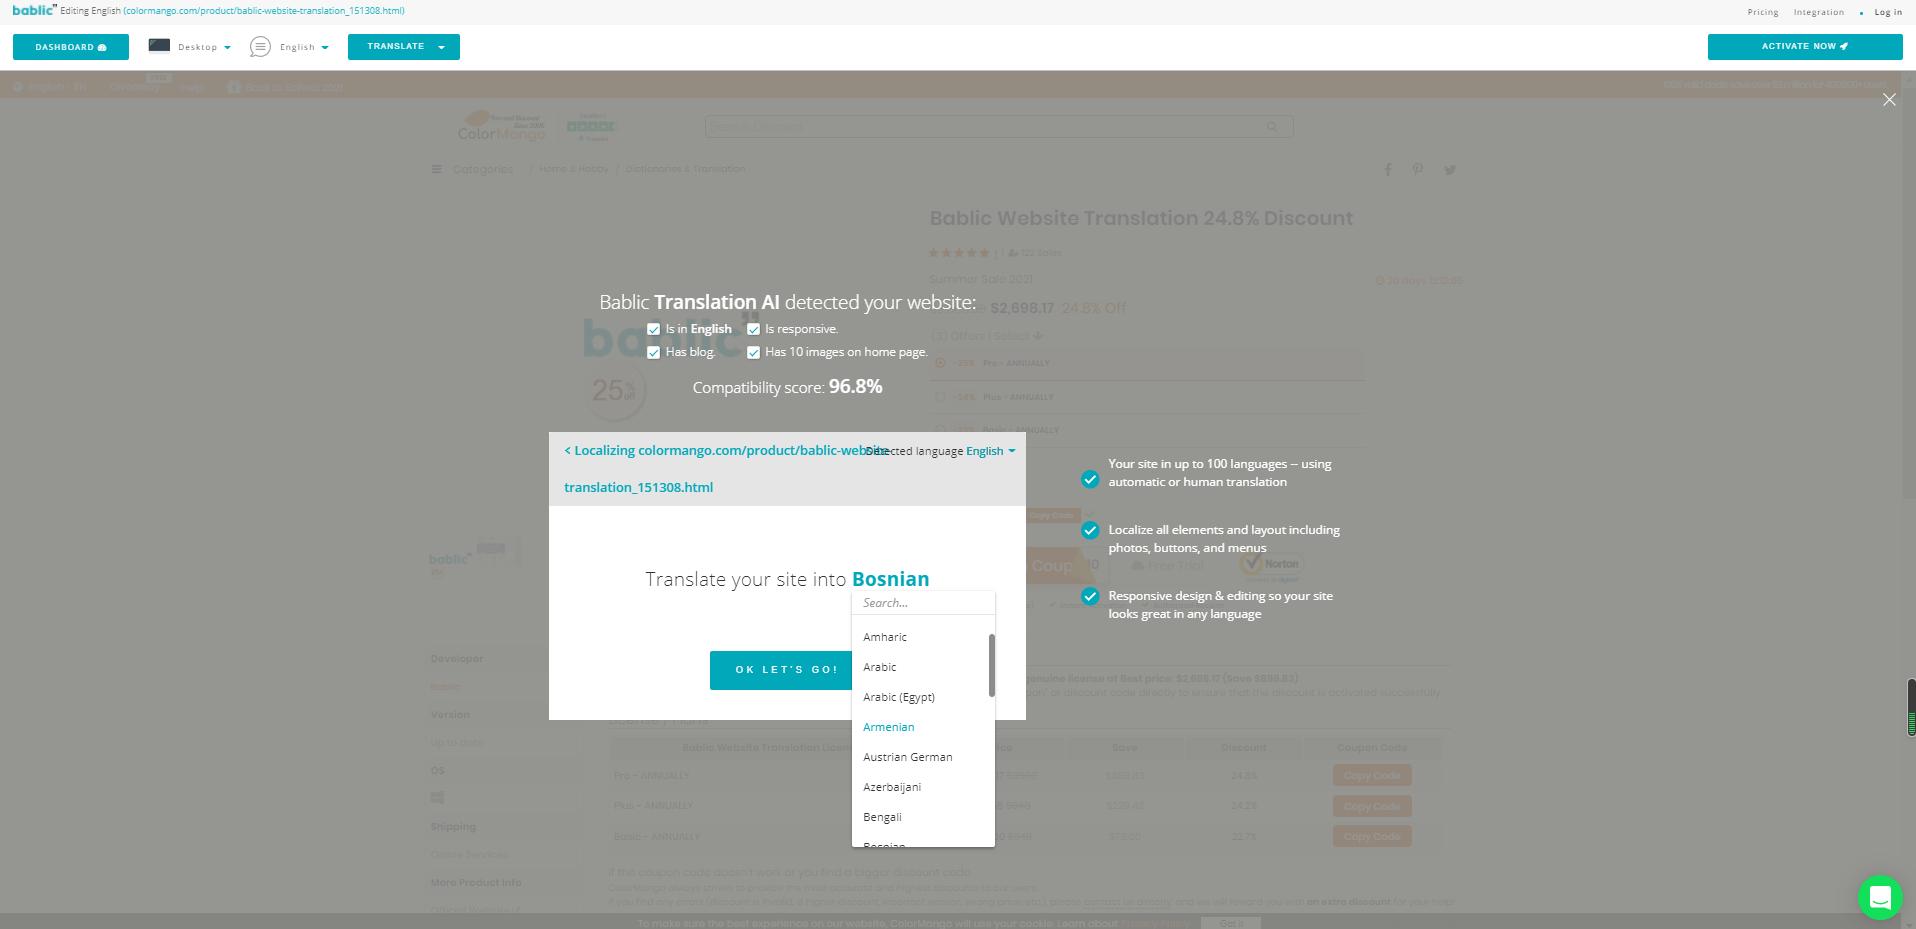 Bablic Website Translation Screenshot